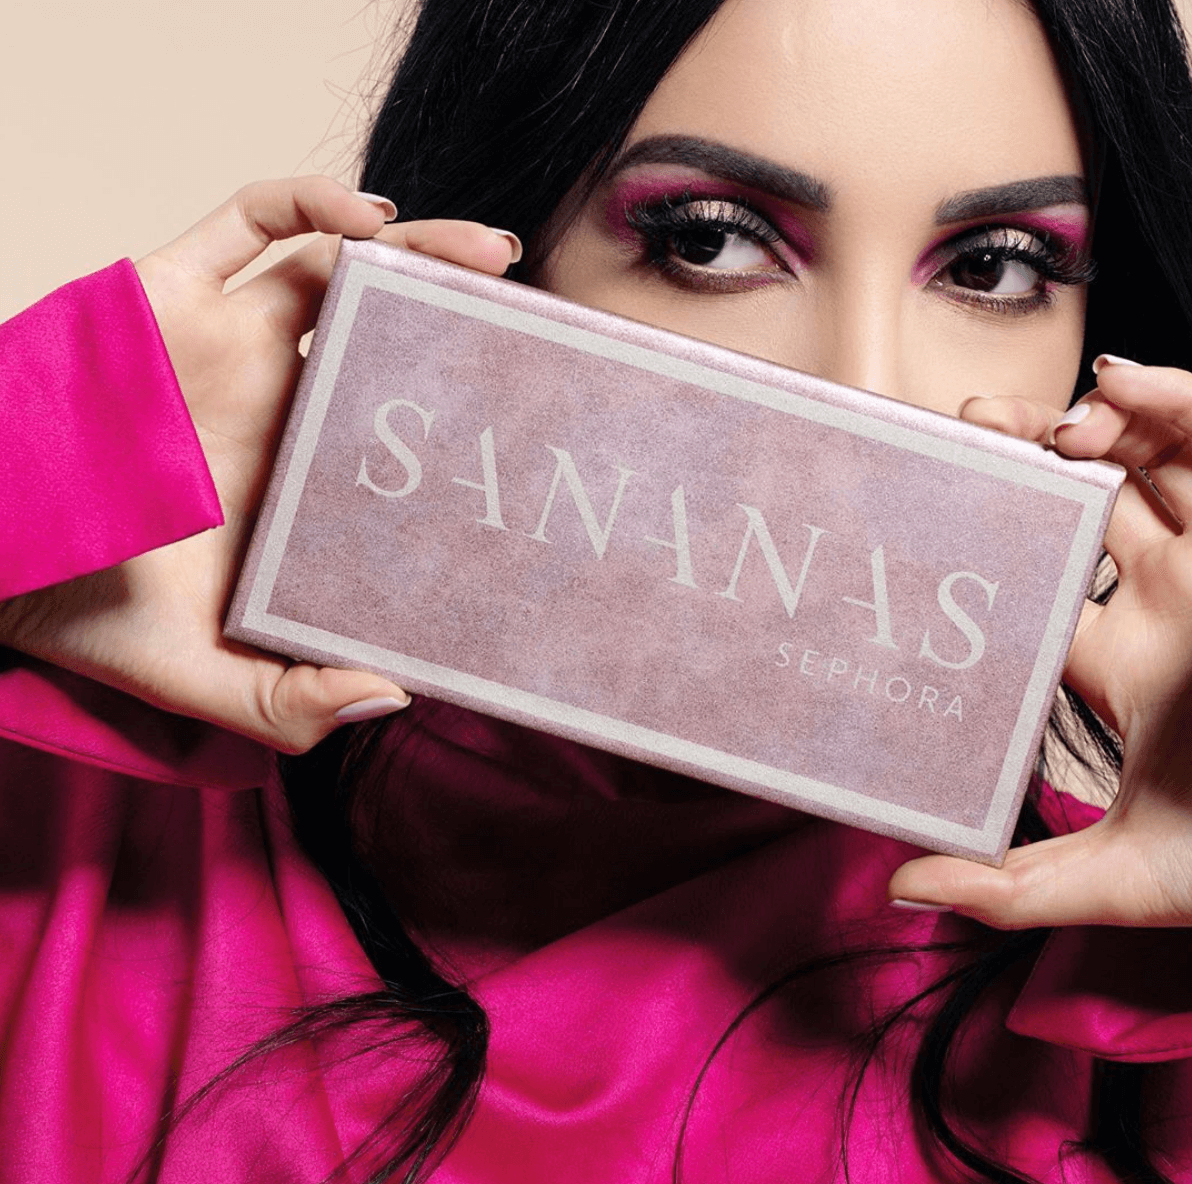 revue-palette-collaboration-sananas-sephora-france-teintes-fards-paupieres-couleurs-avis-prix-swatch-makeupbyazadig-date-sortie-beautynews-makeup